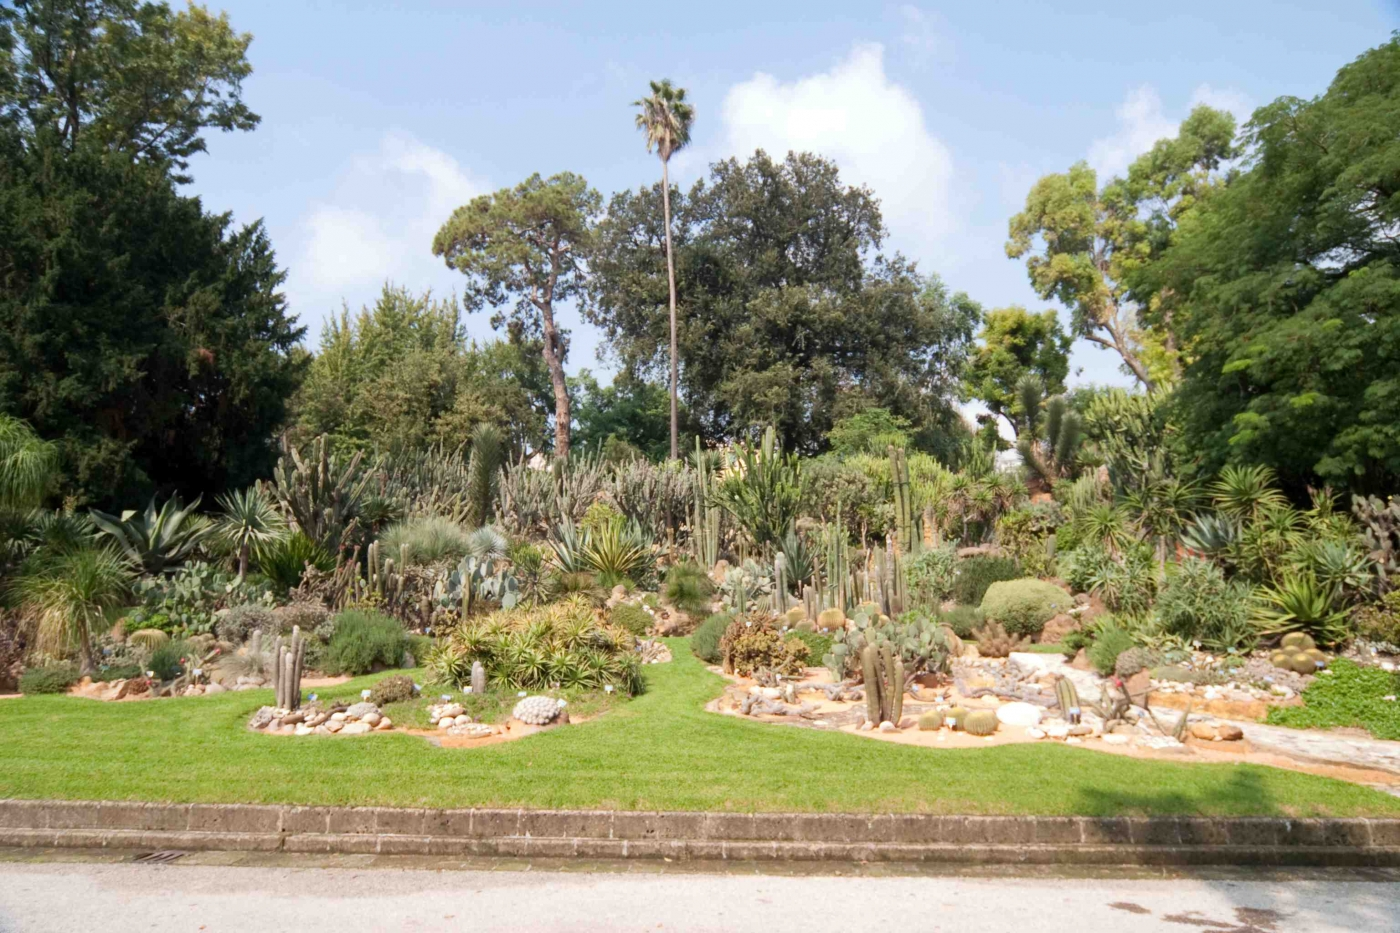 Jardin bot nico for Jardin botanico eventos